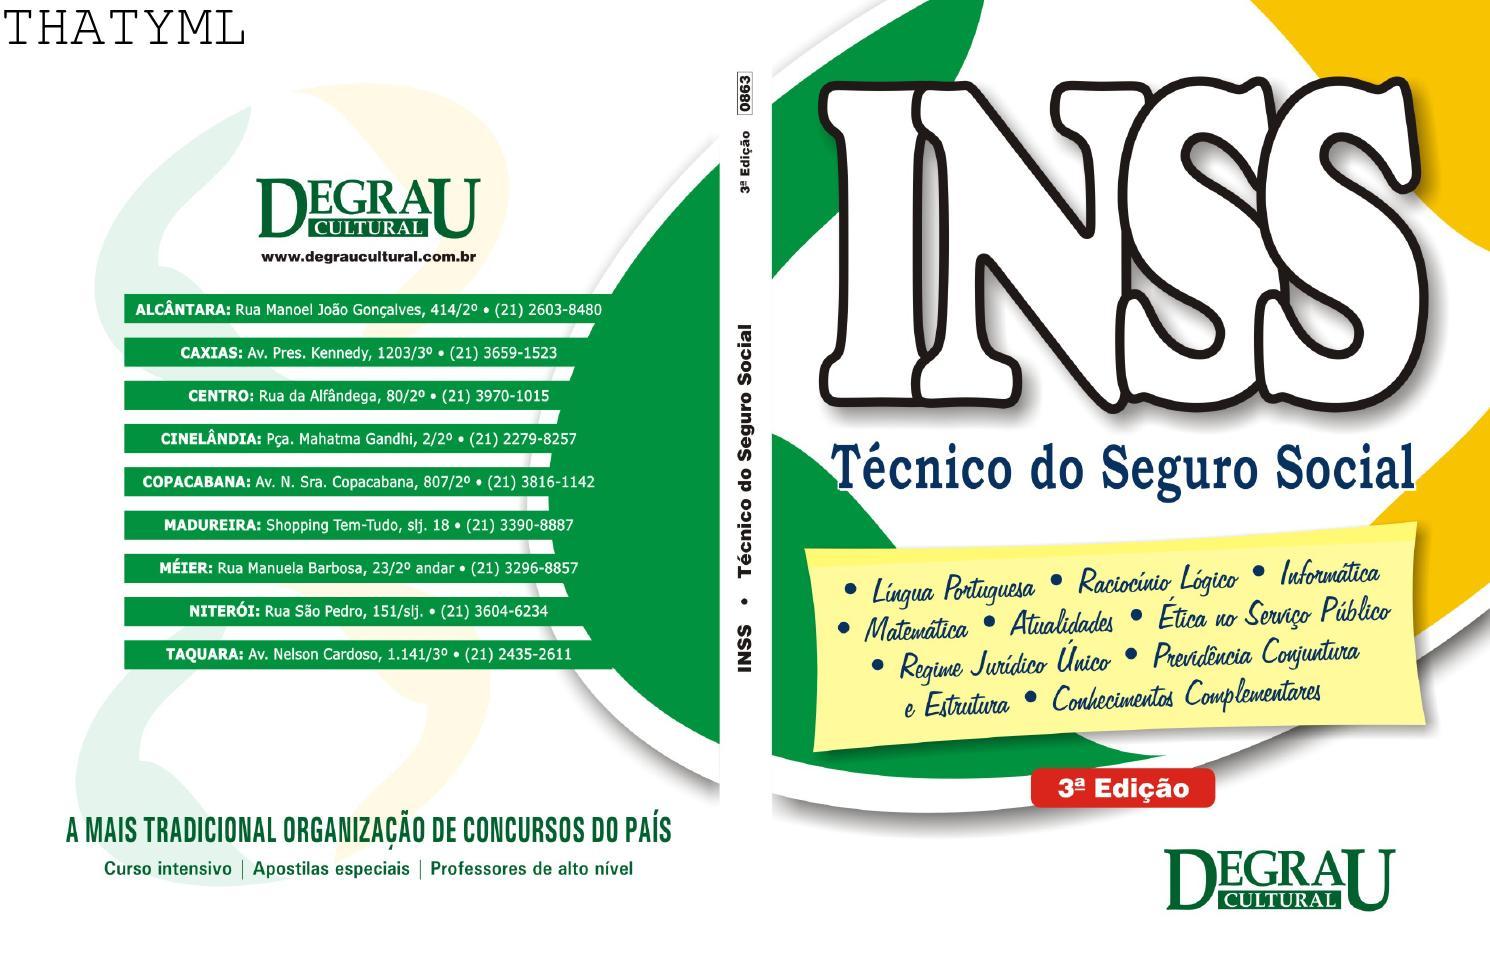 04 apostila inss completa degrau cultural by Cris Carvalho - issuu 5982fcf9fce8b